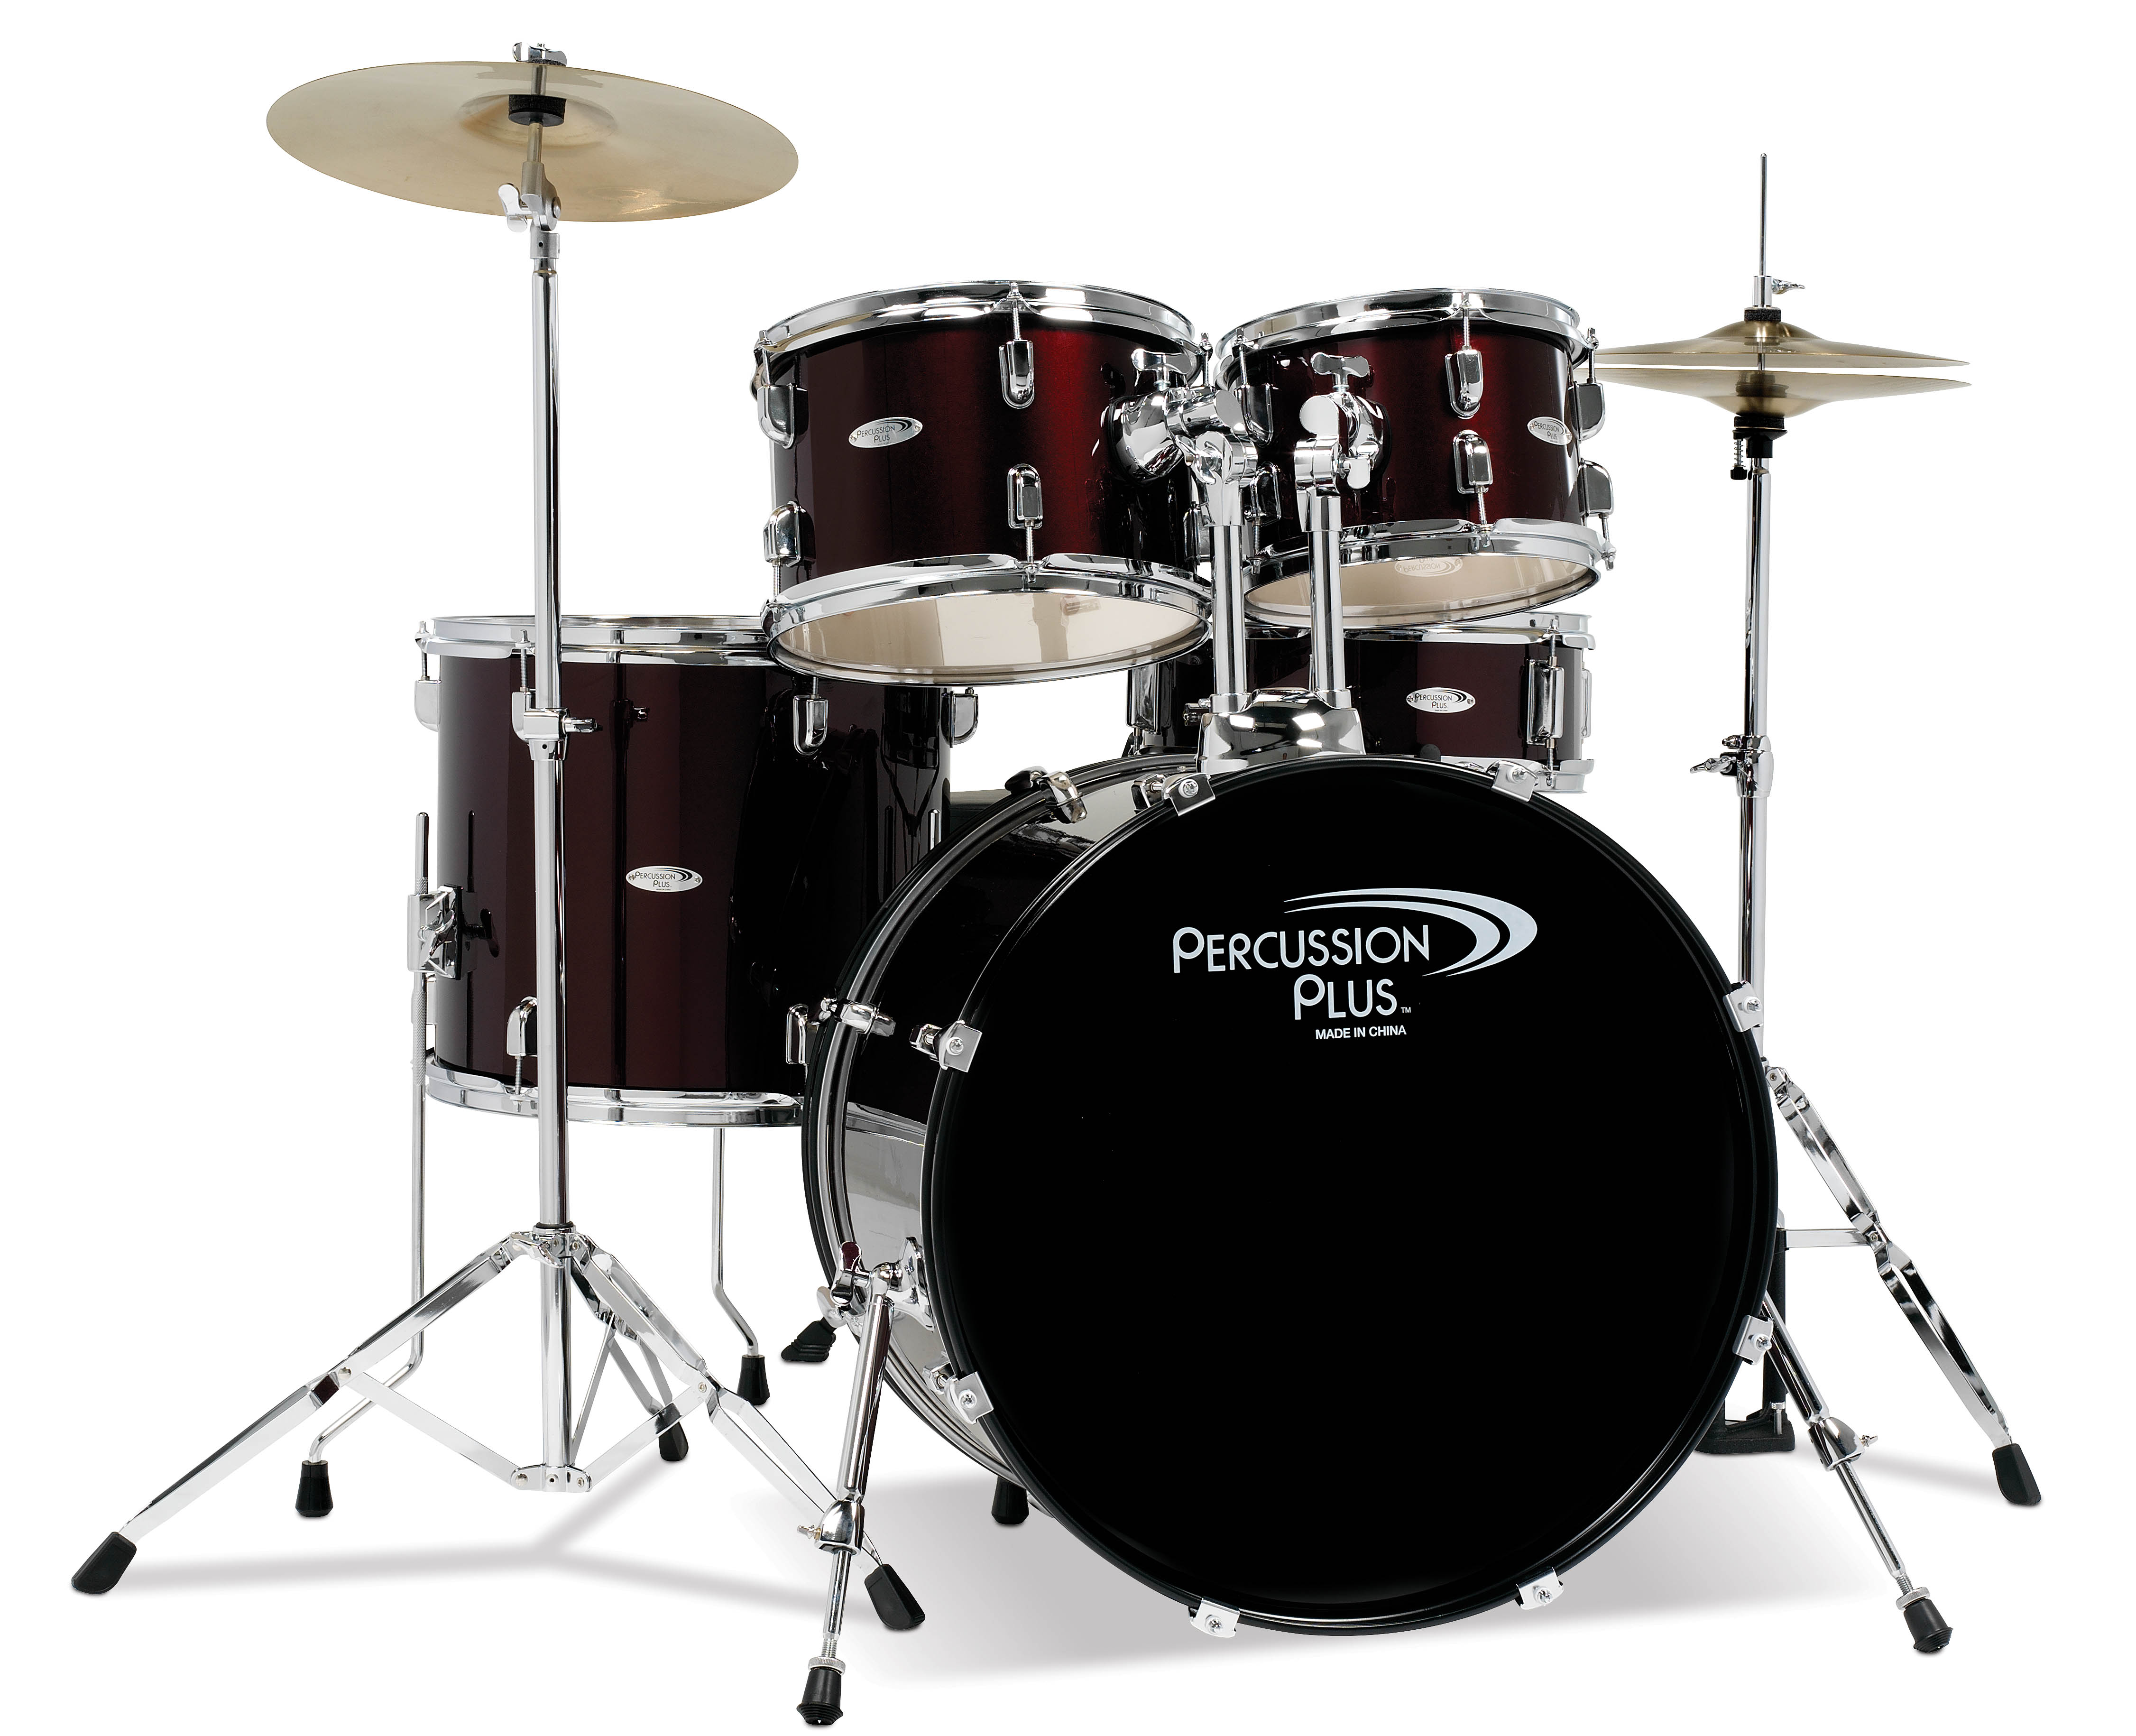 Percussion Plus 5-Piece Drum Set by Percussion Plus